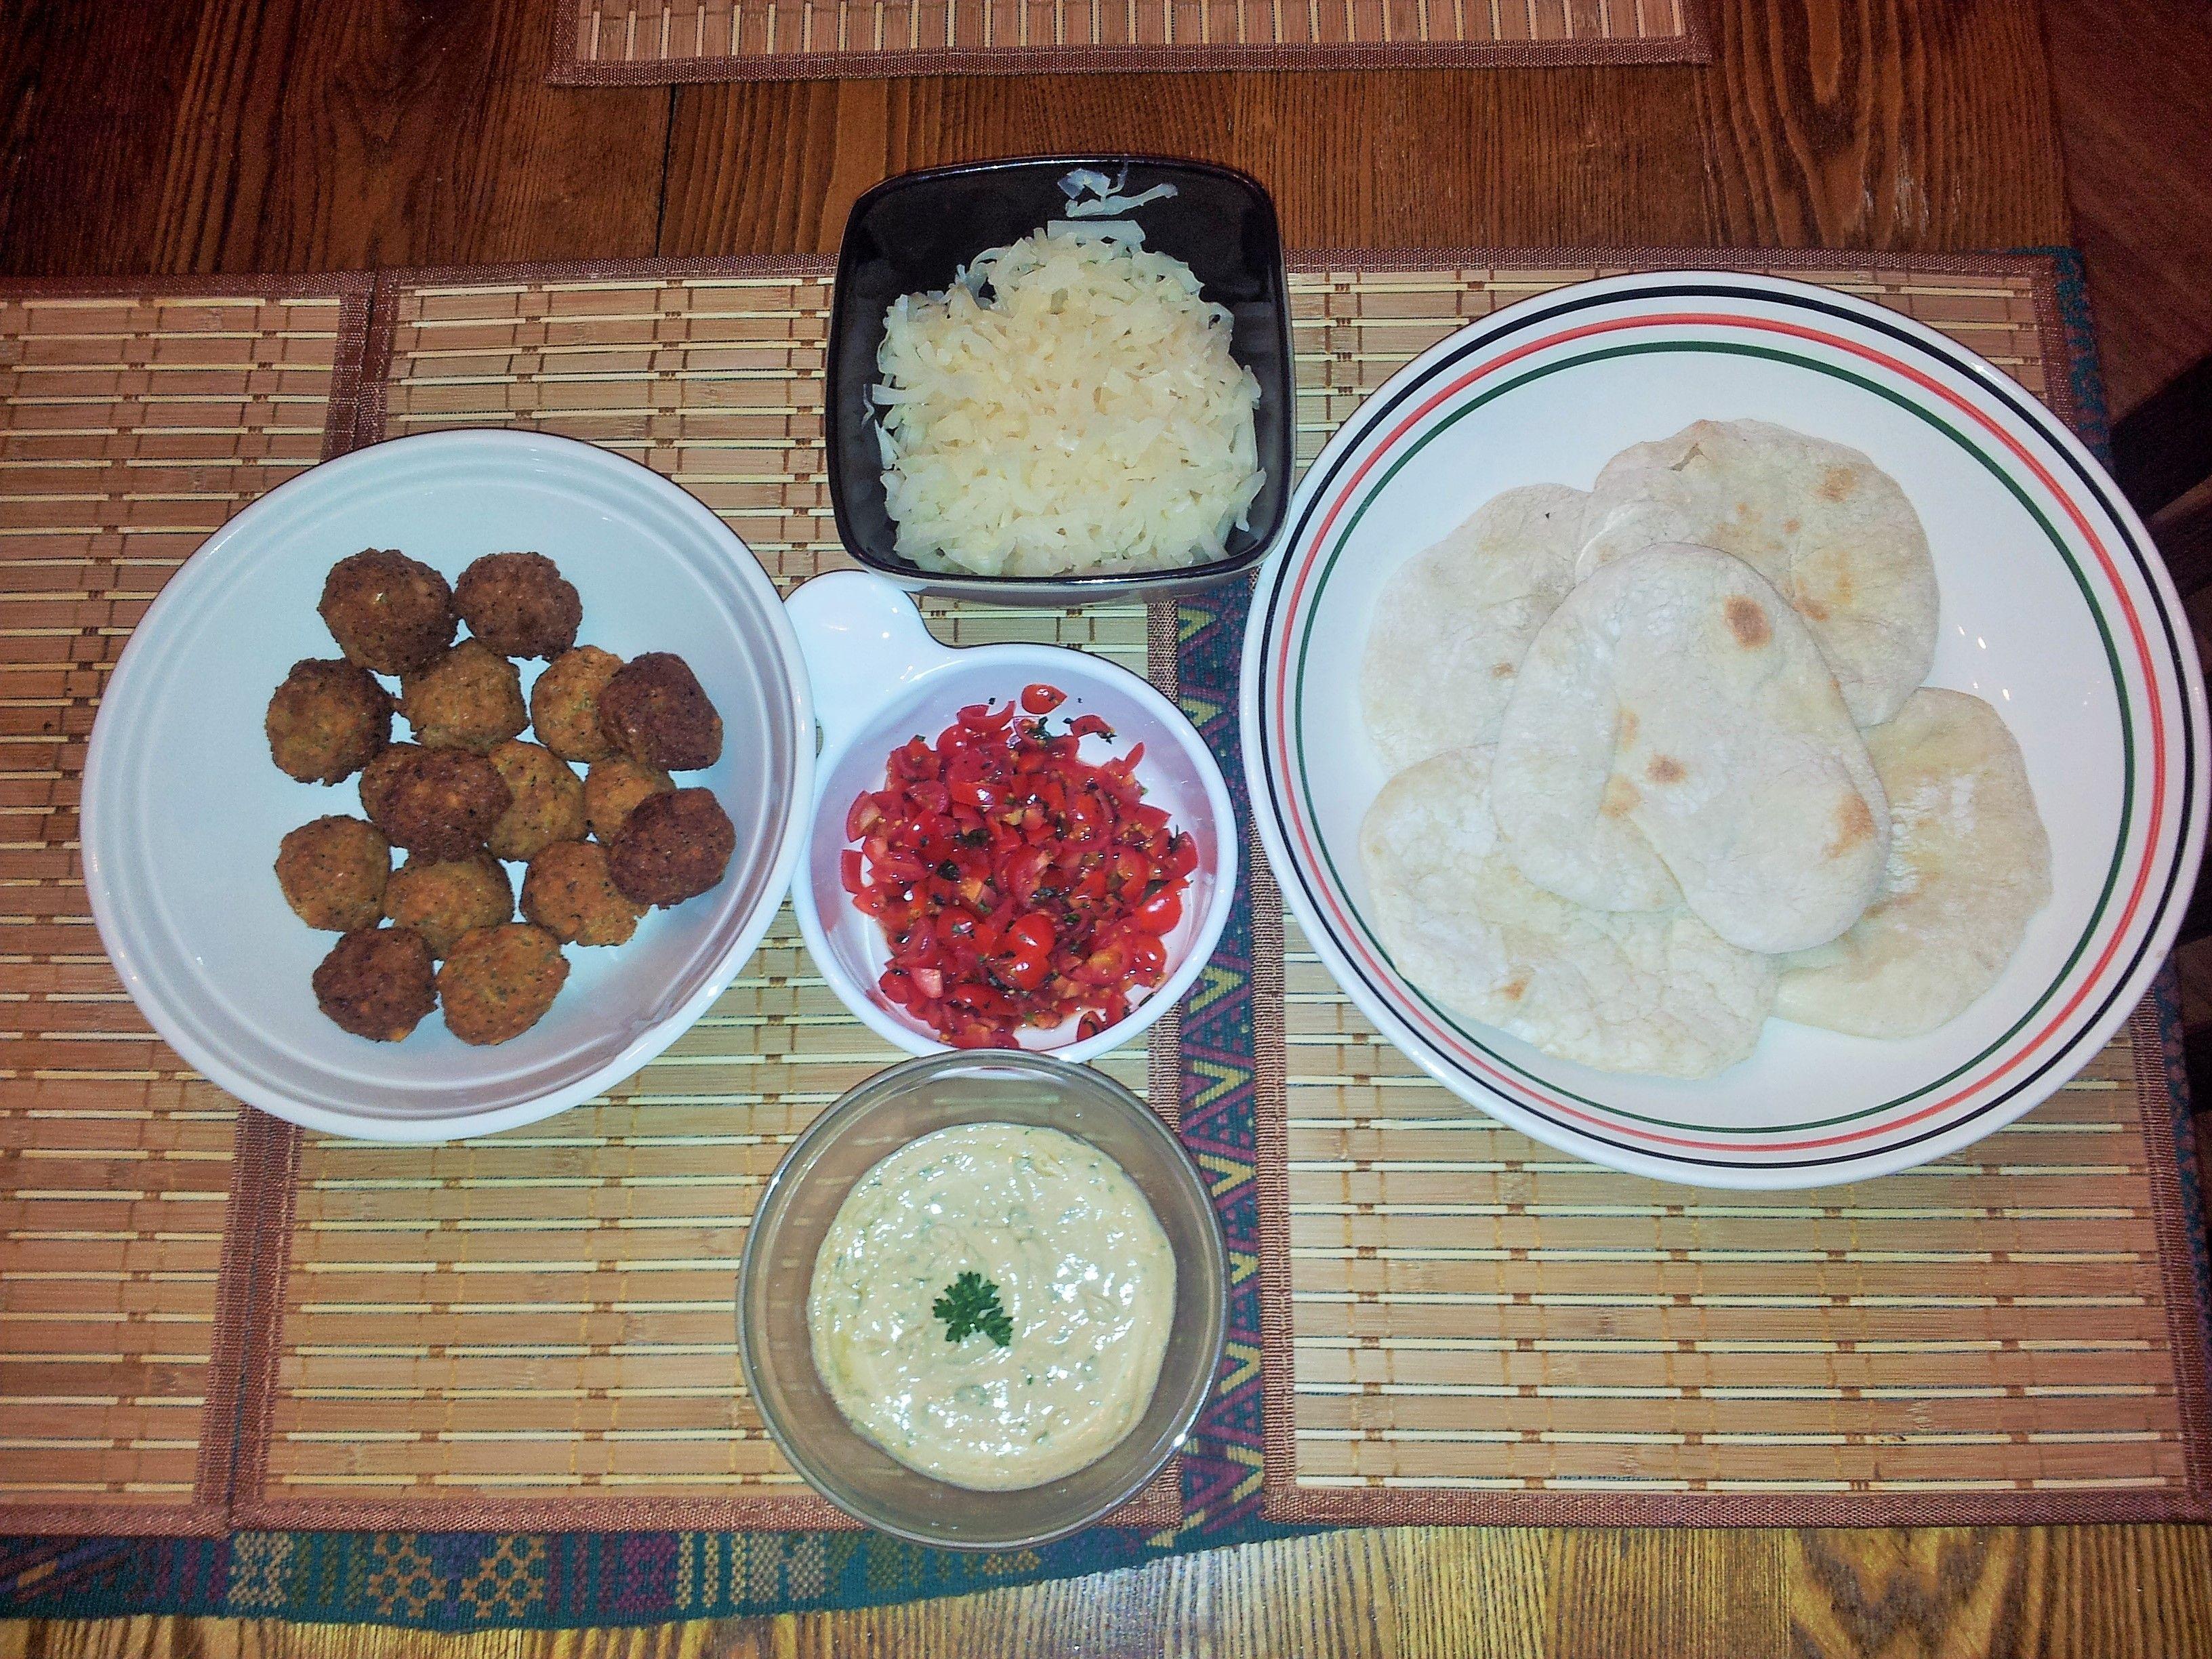 Falafel, Pita, & tahini sauce - made from scratch.